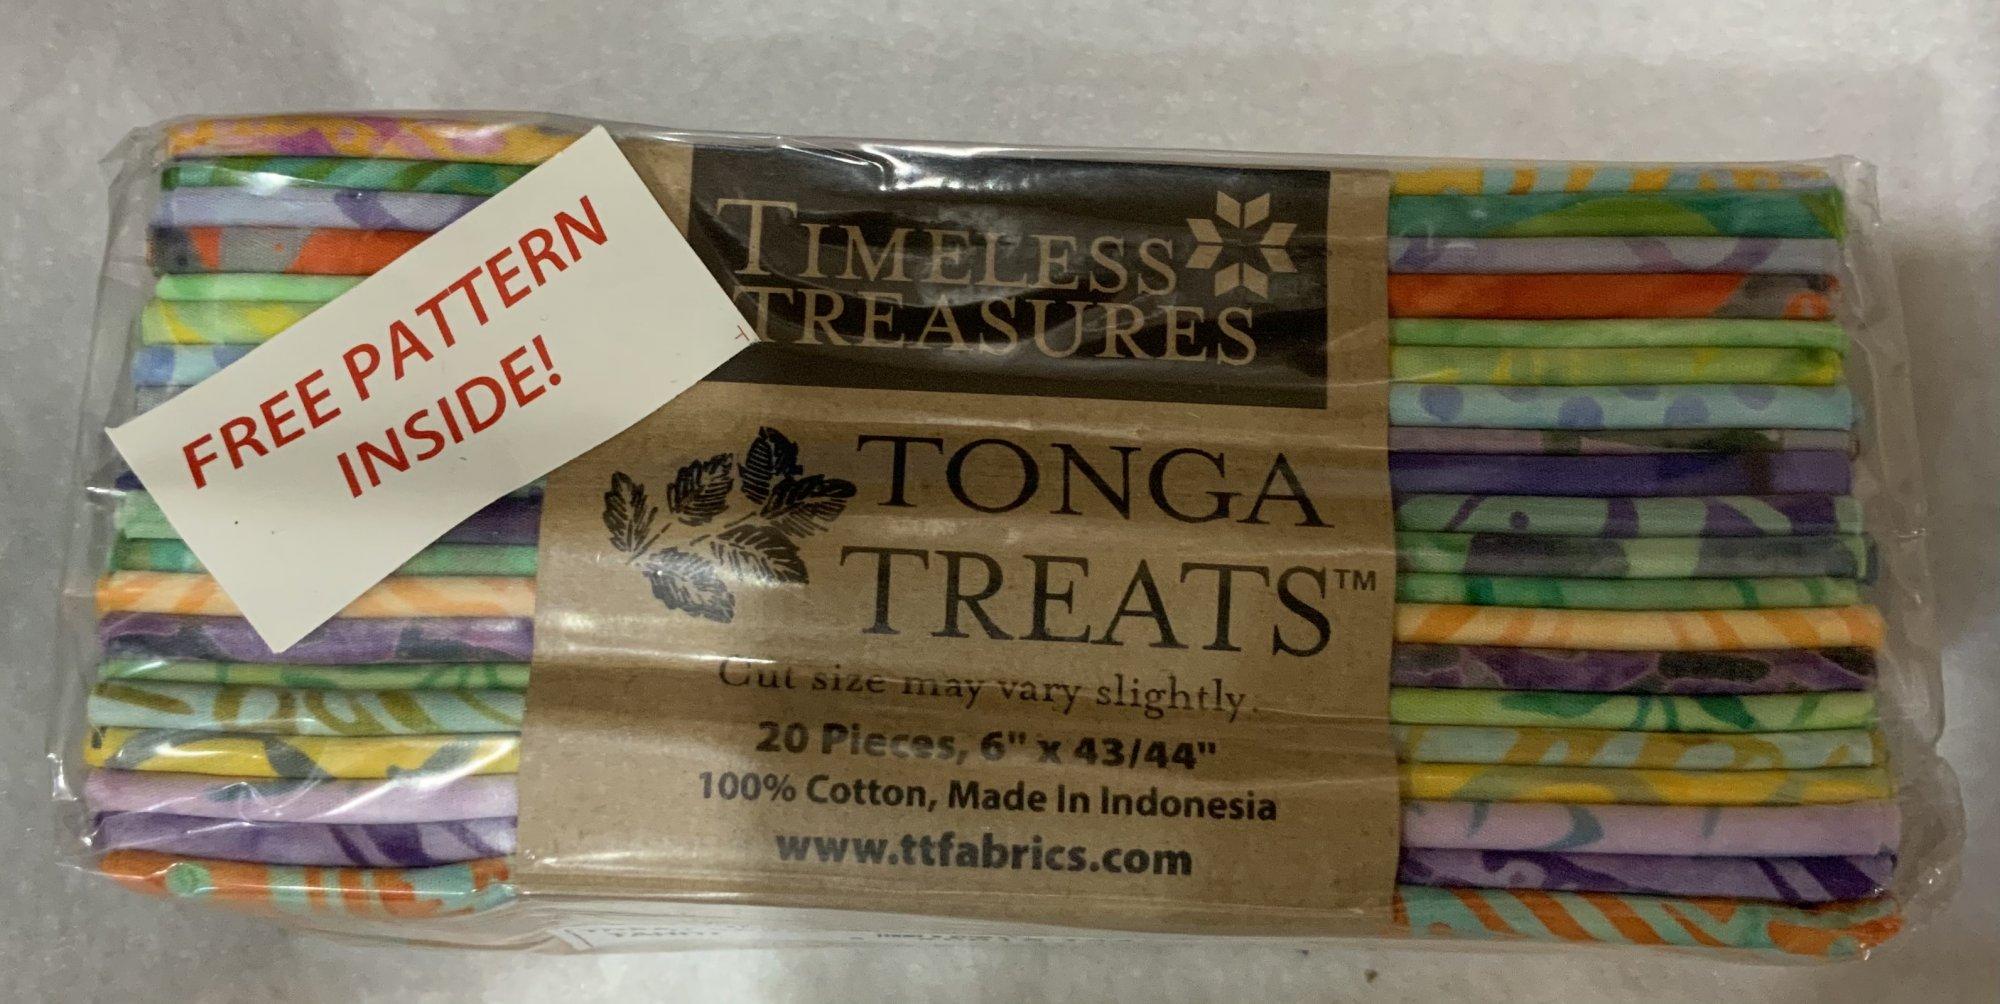 Tonga Treat 6 Pack Tahiti (20 Pieces, 6 inch x 44 inch) - Timeless Treasures Fabric